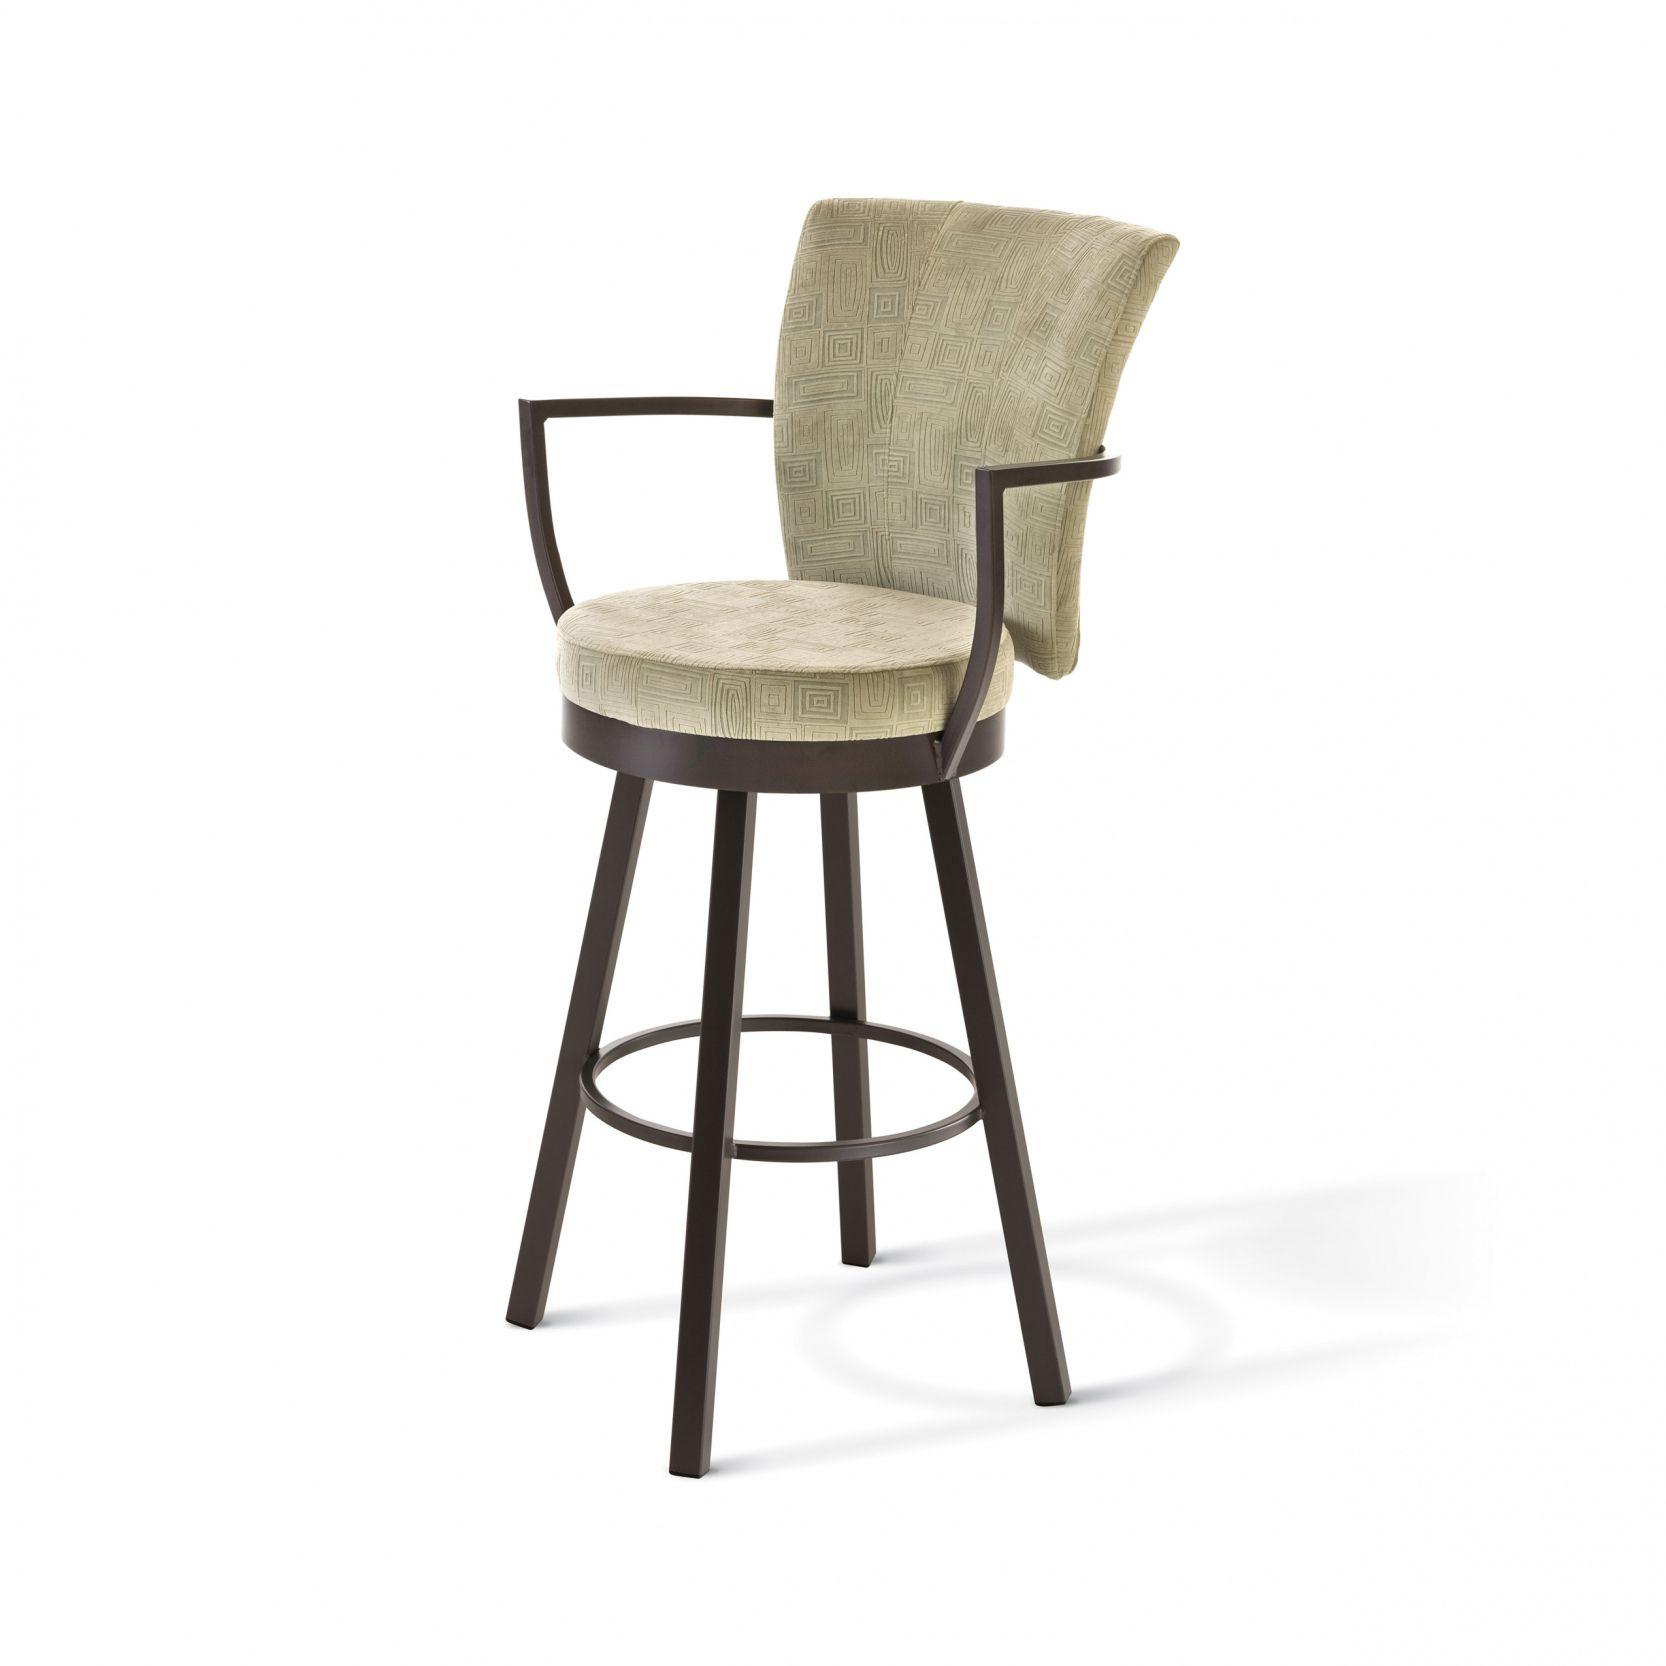 kays bar stools albuquerque modern vintage furniture check